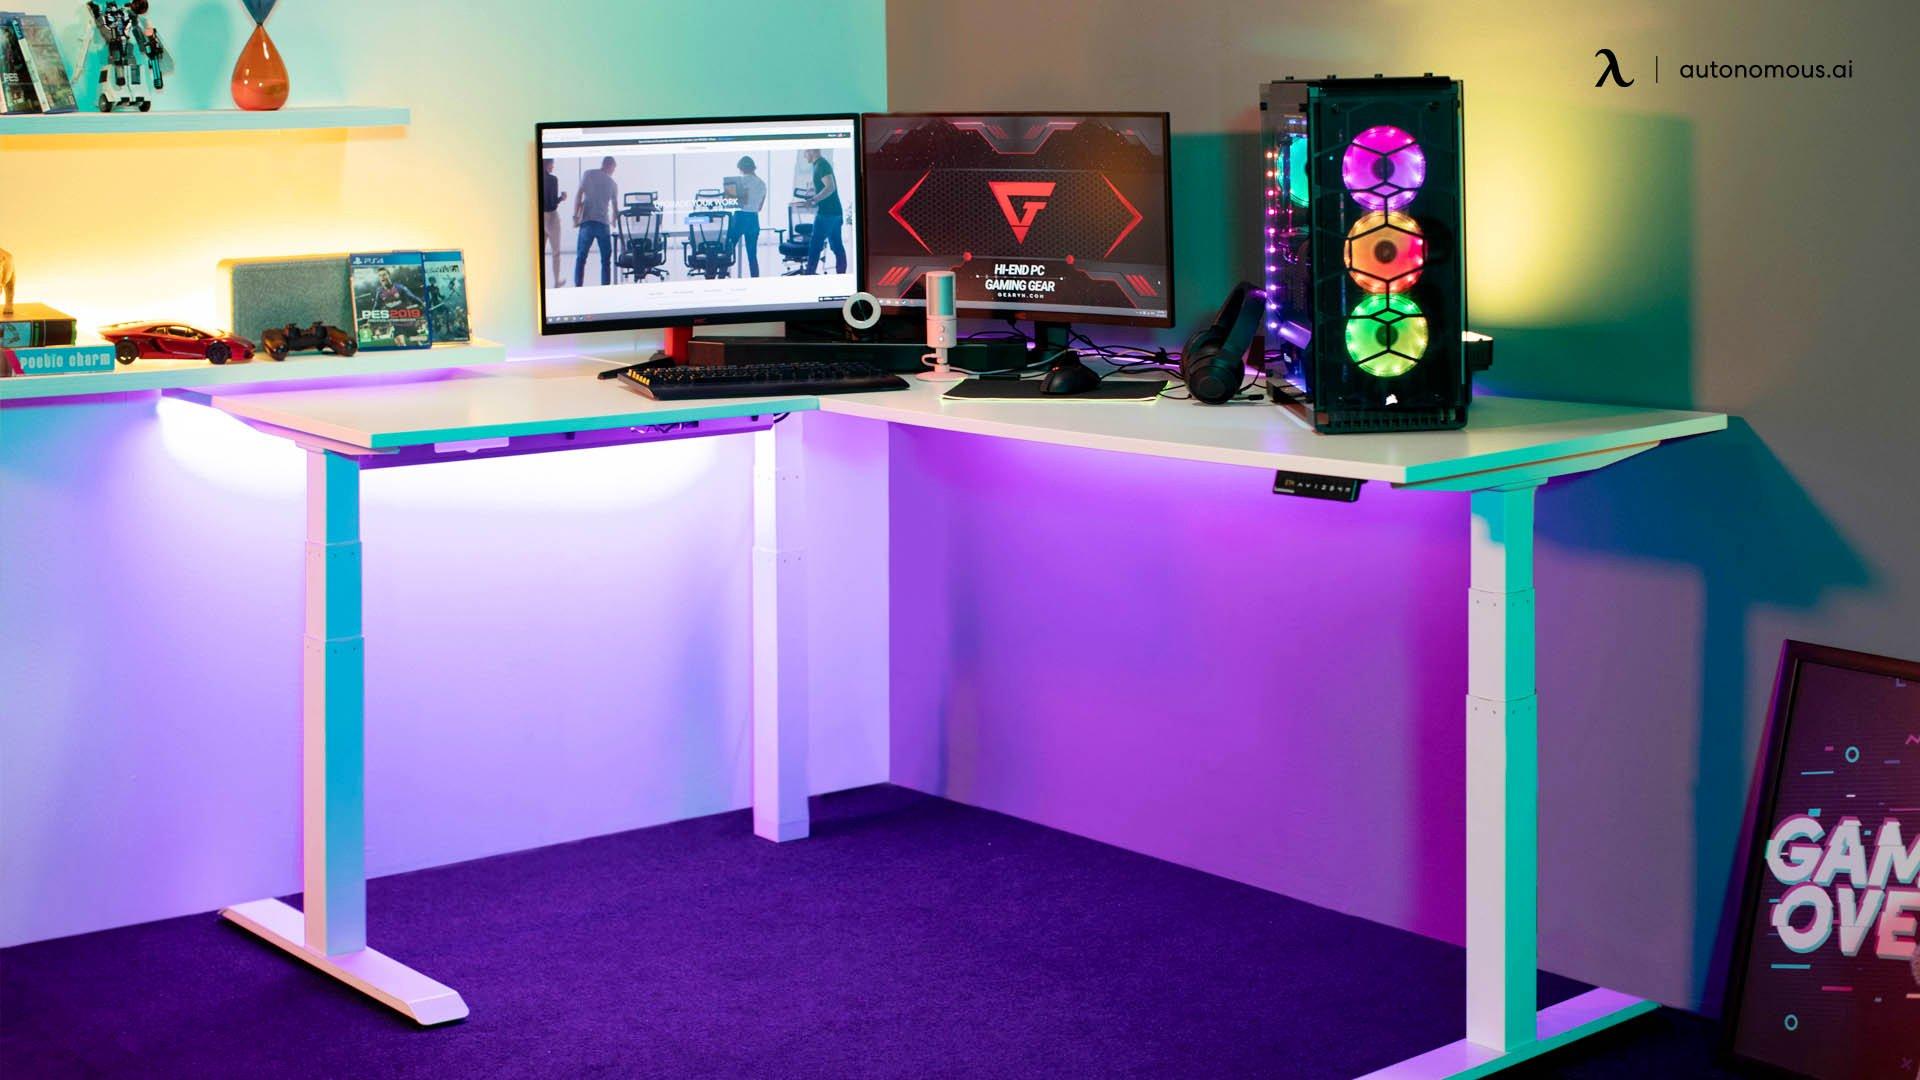 Add a desk into the room